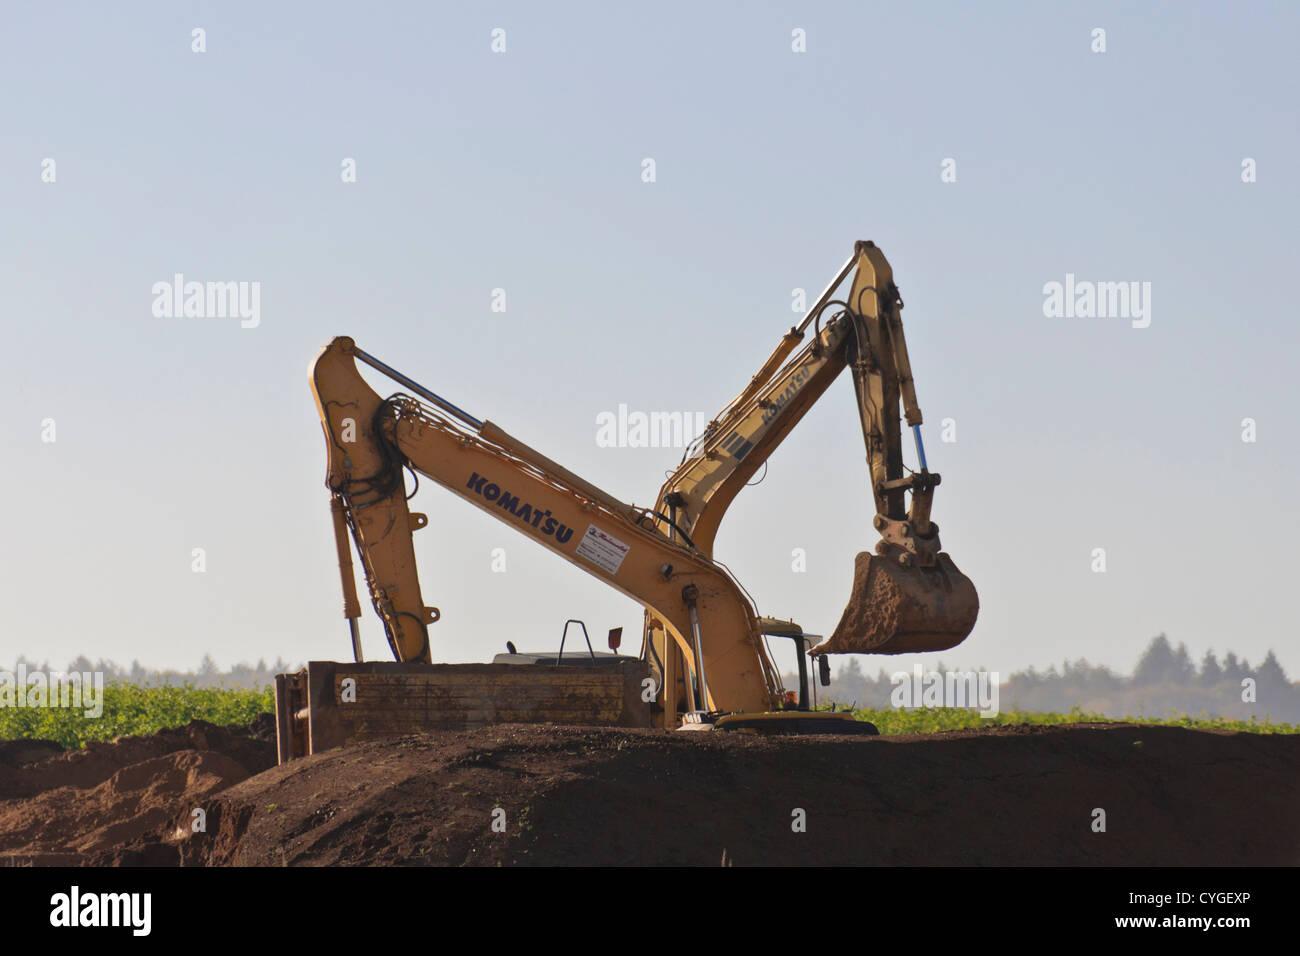 Two bucket excavators - Stock Image